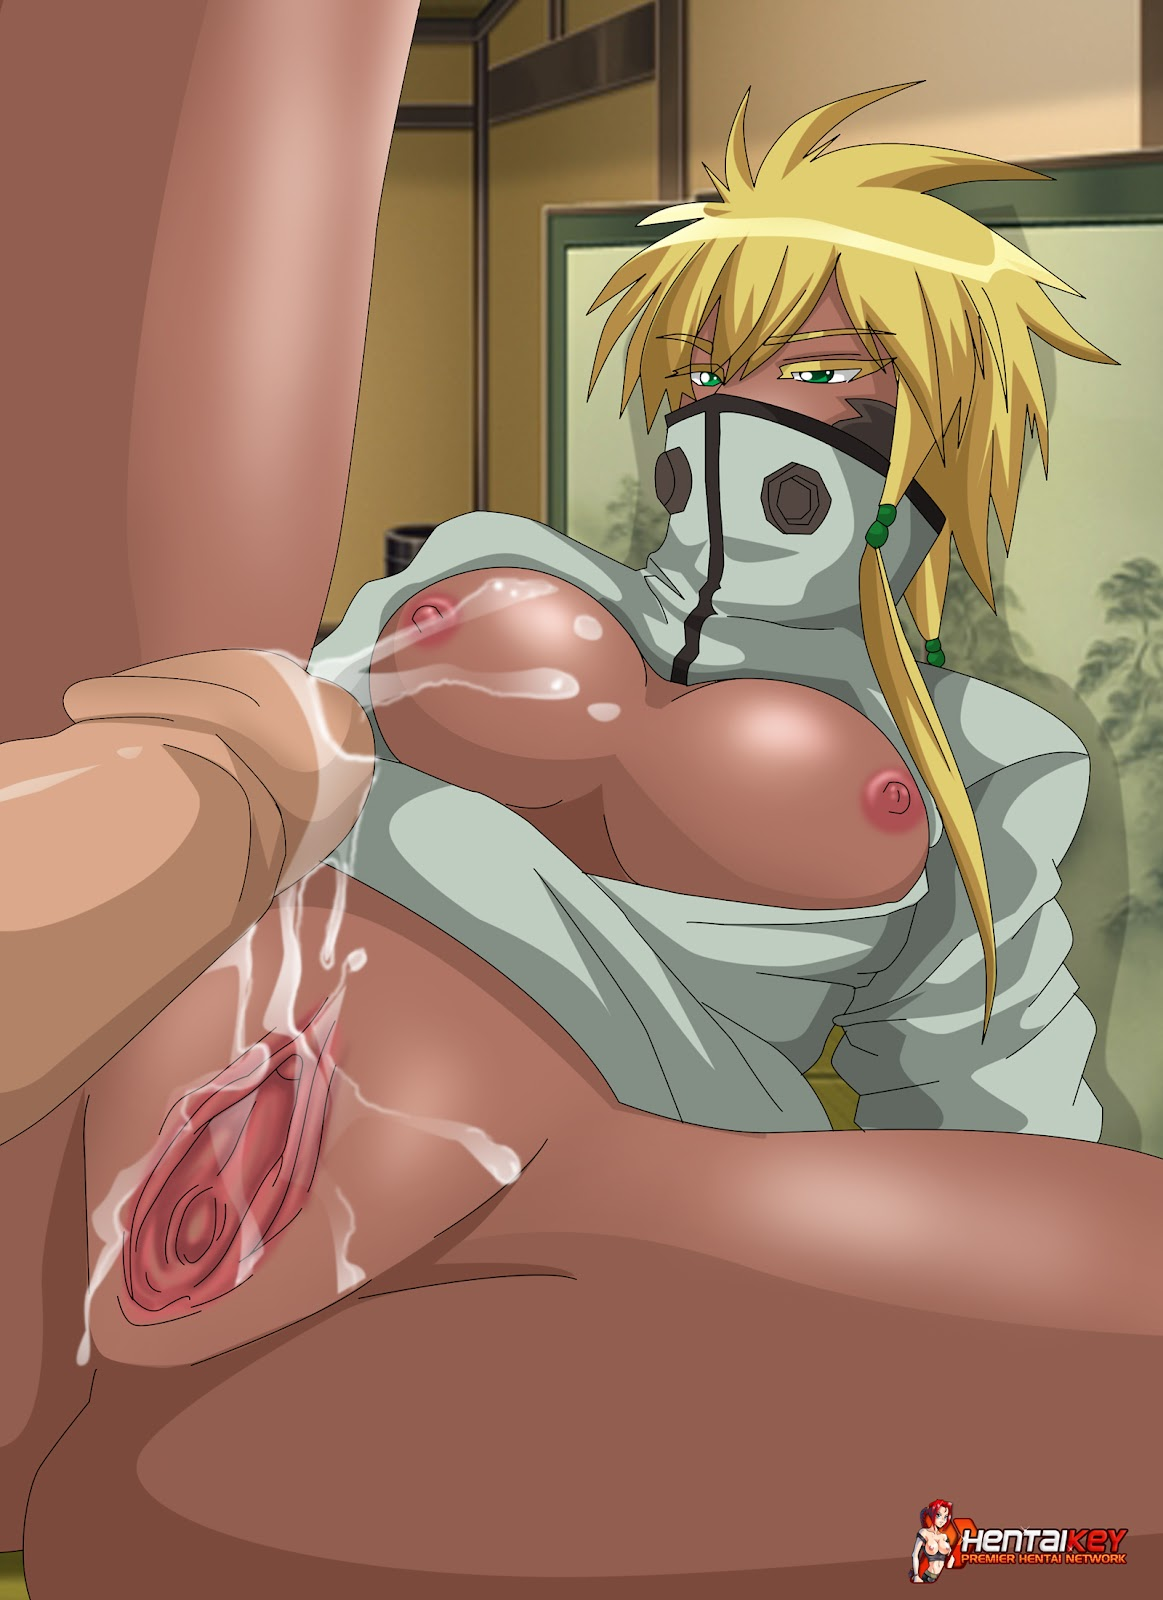 Porno hental nude pics